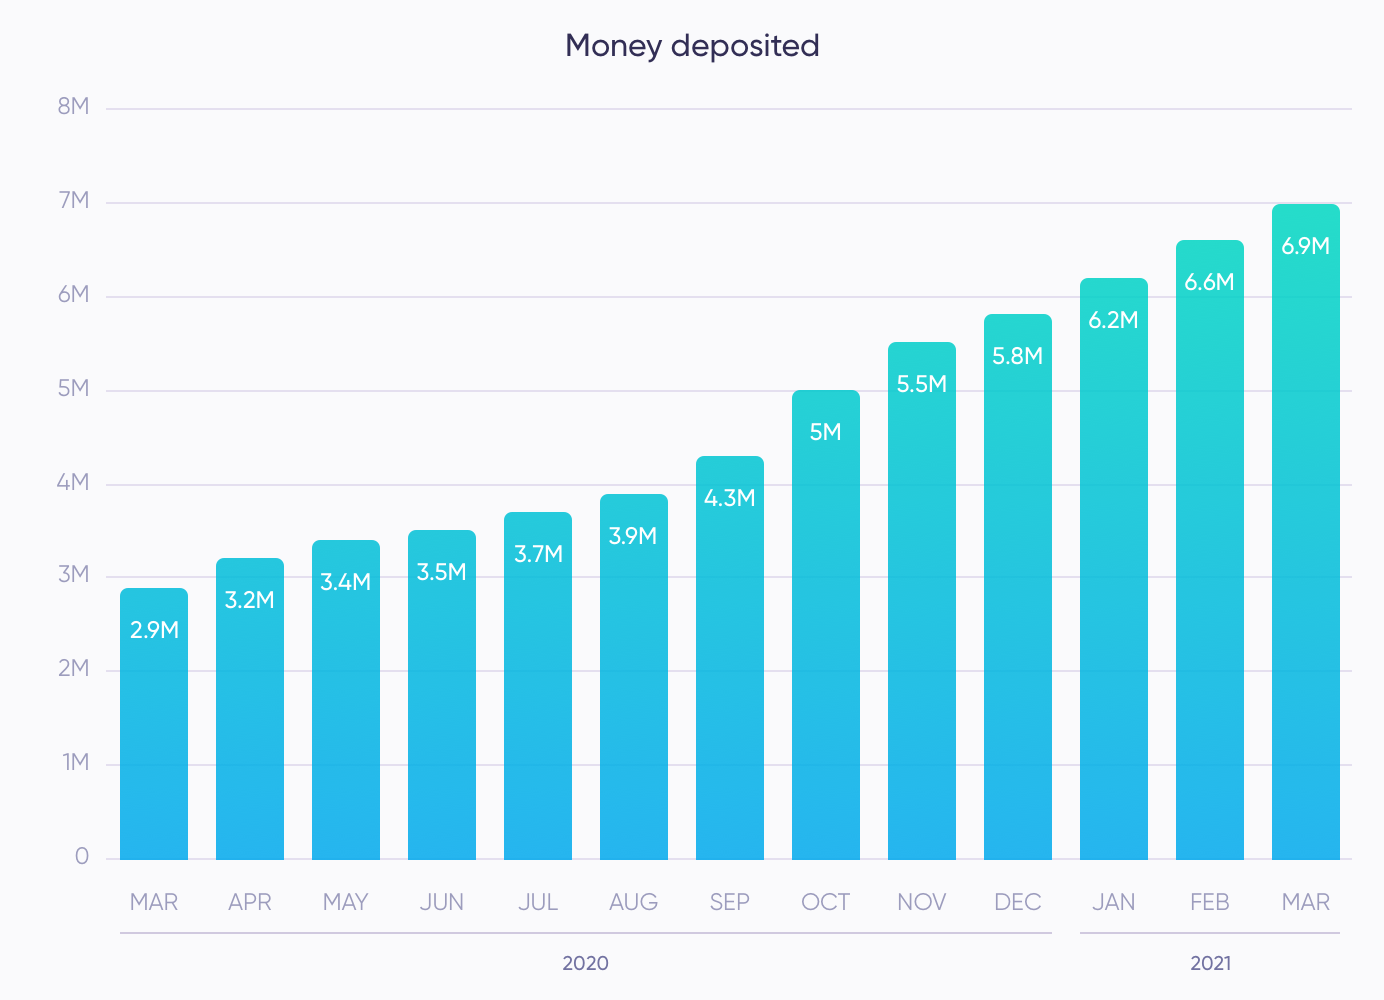 Money Deposited in March